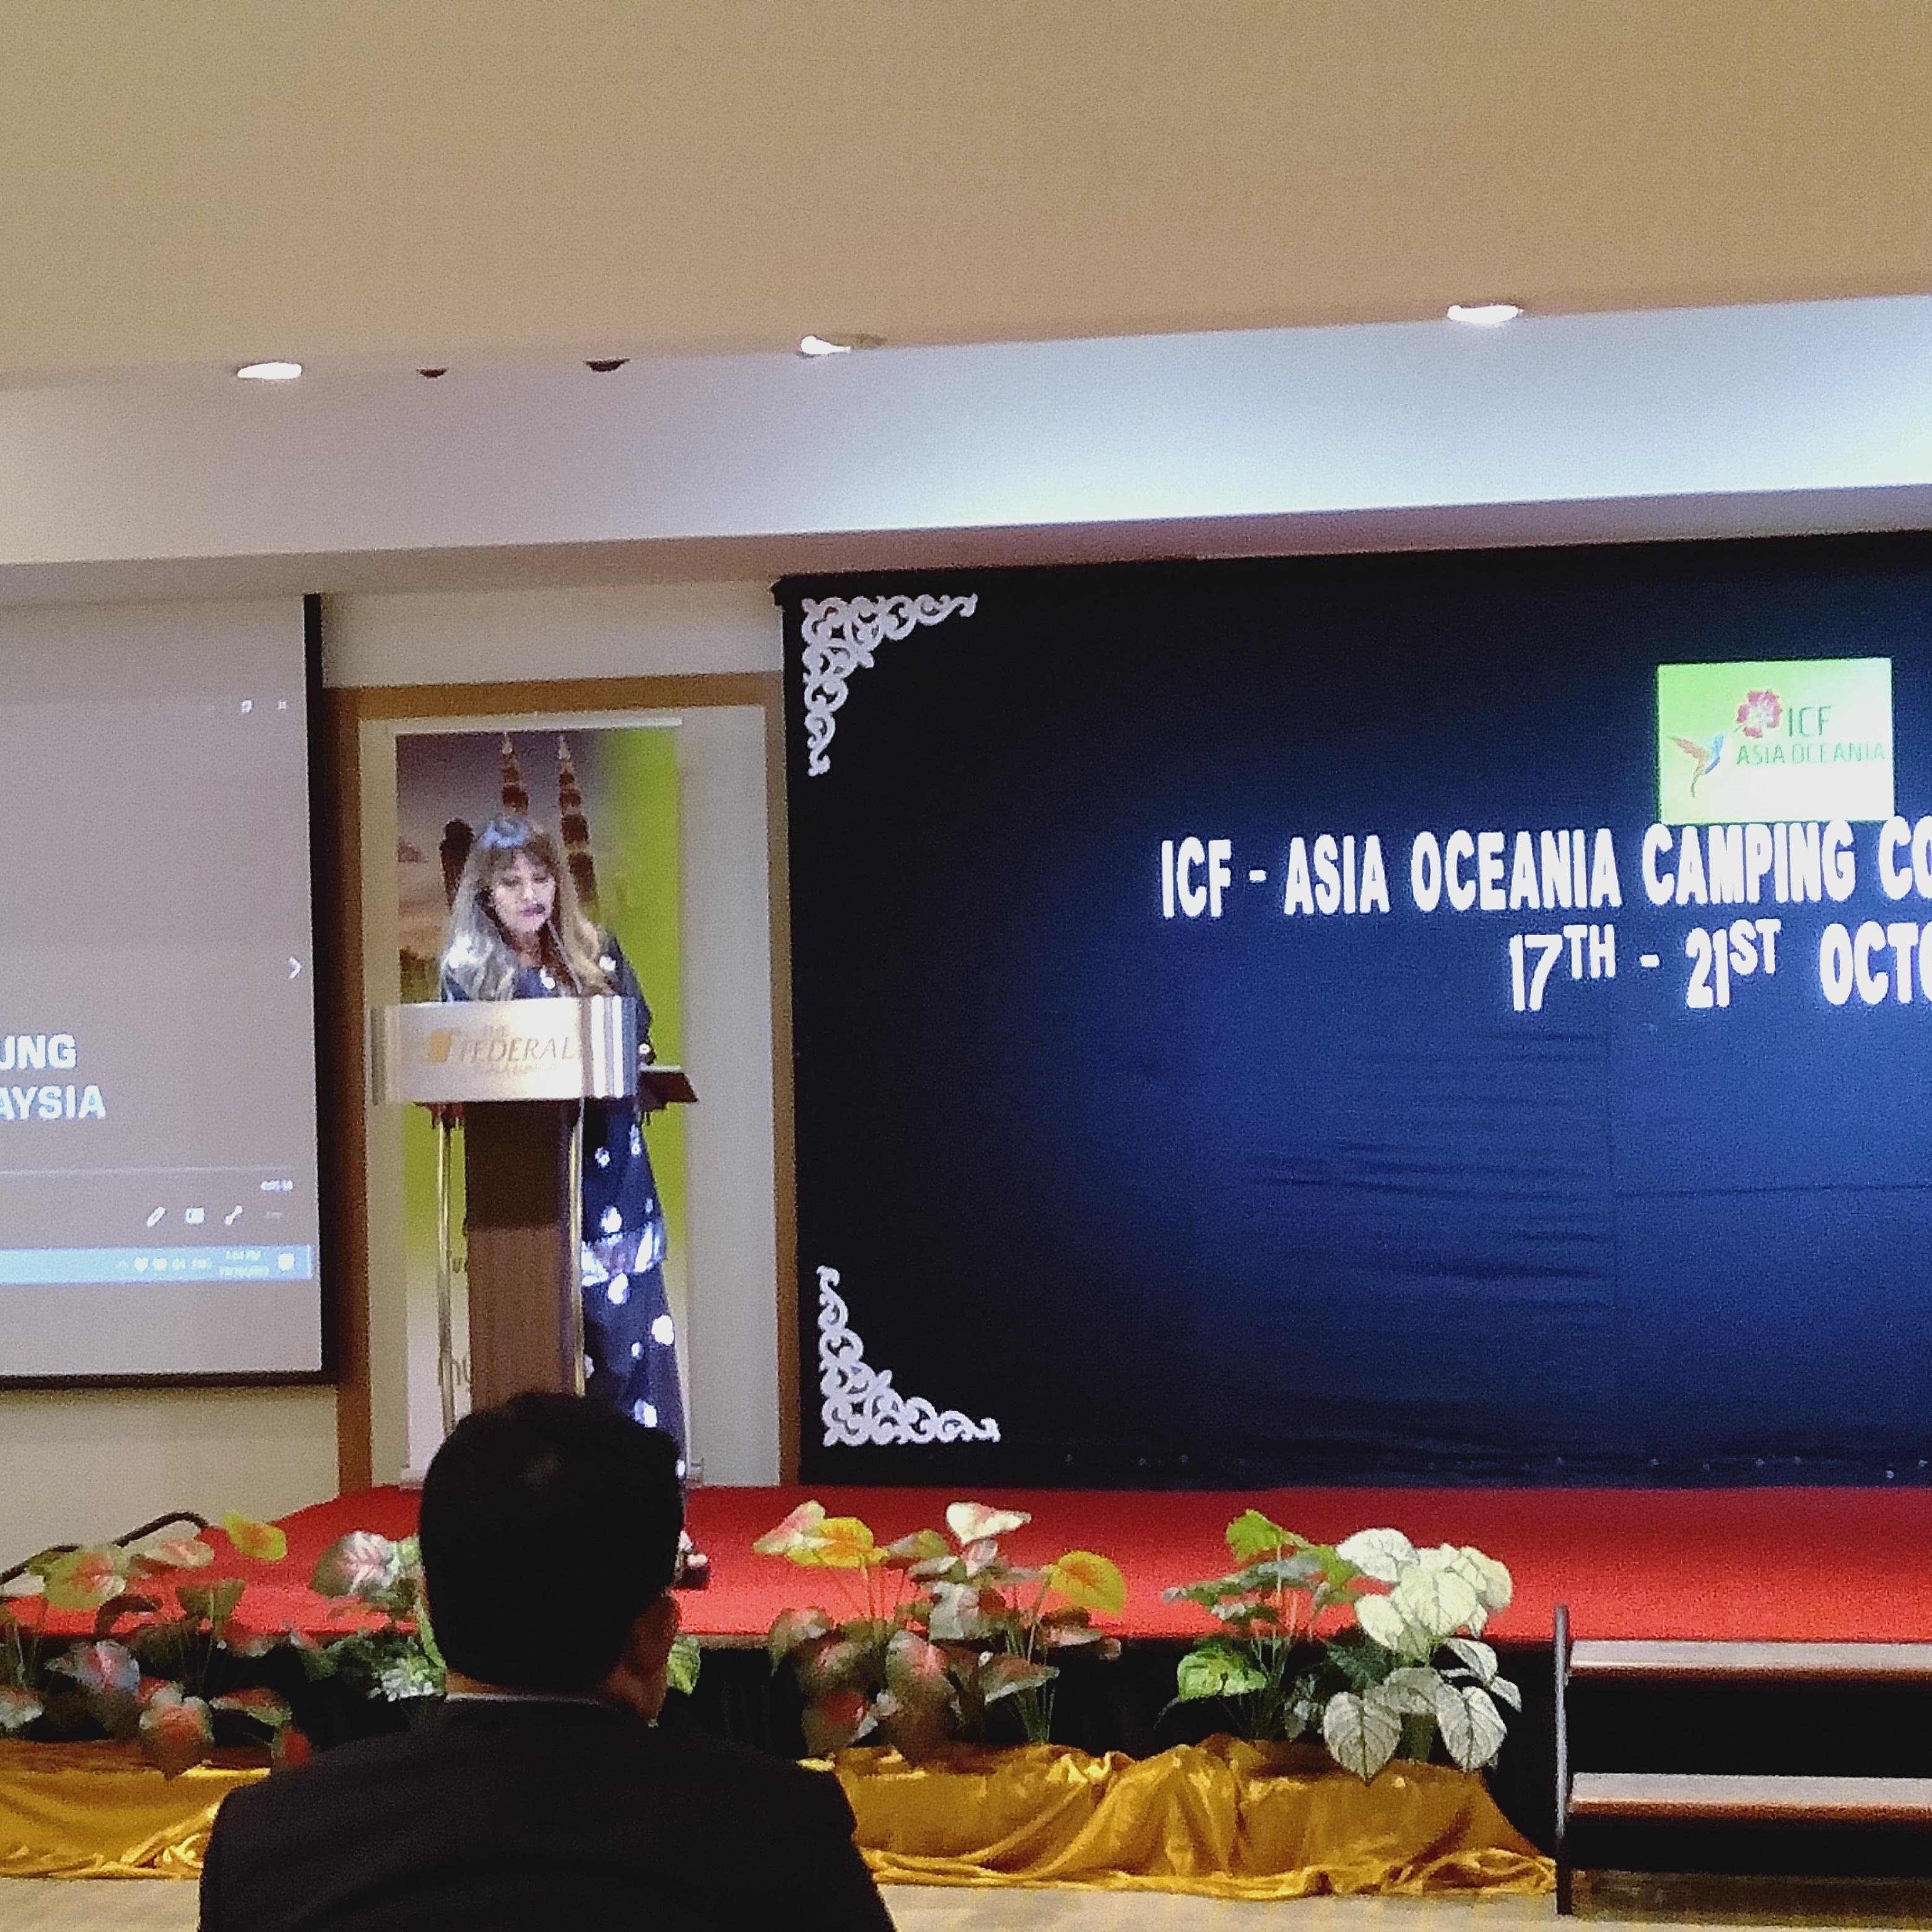 ICF aocc Malaysia tanah aina icf asia oceania 2019 glamping camping congress